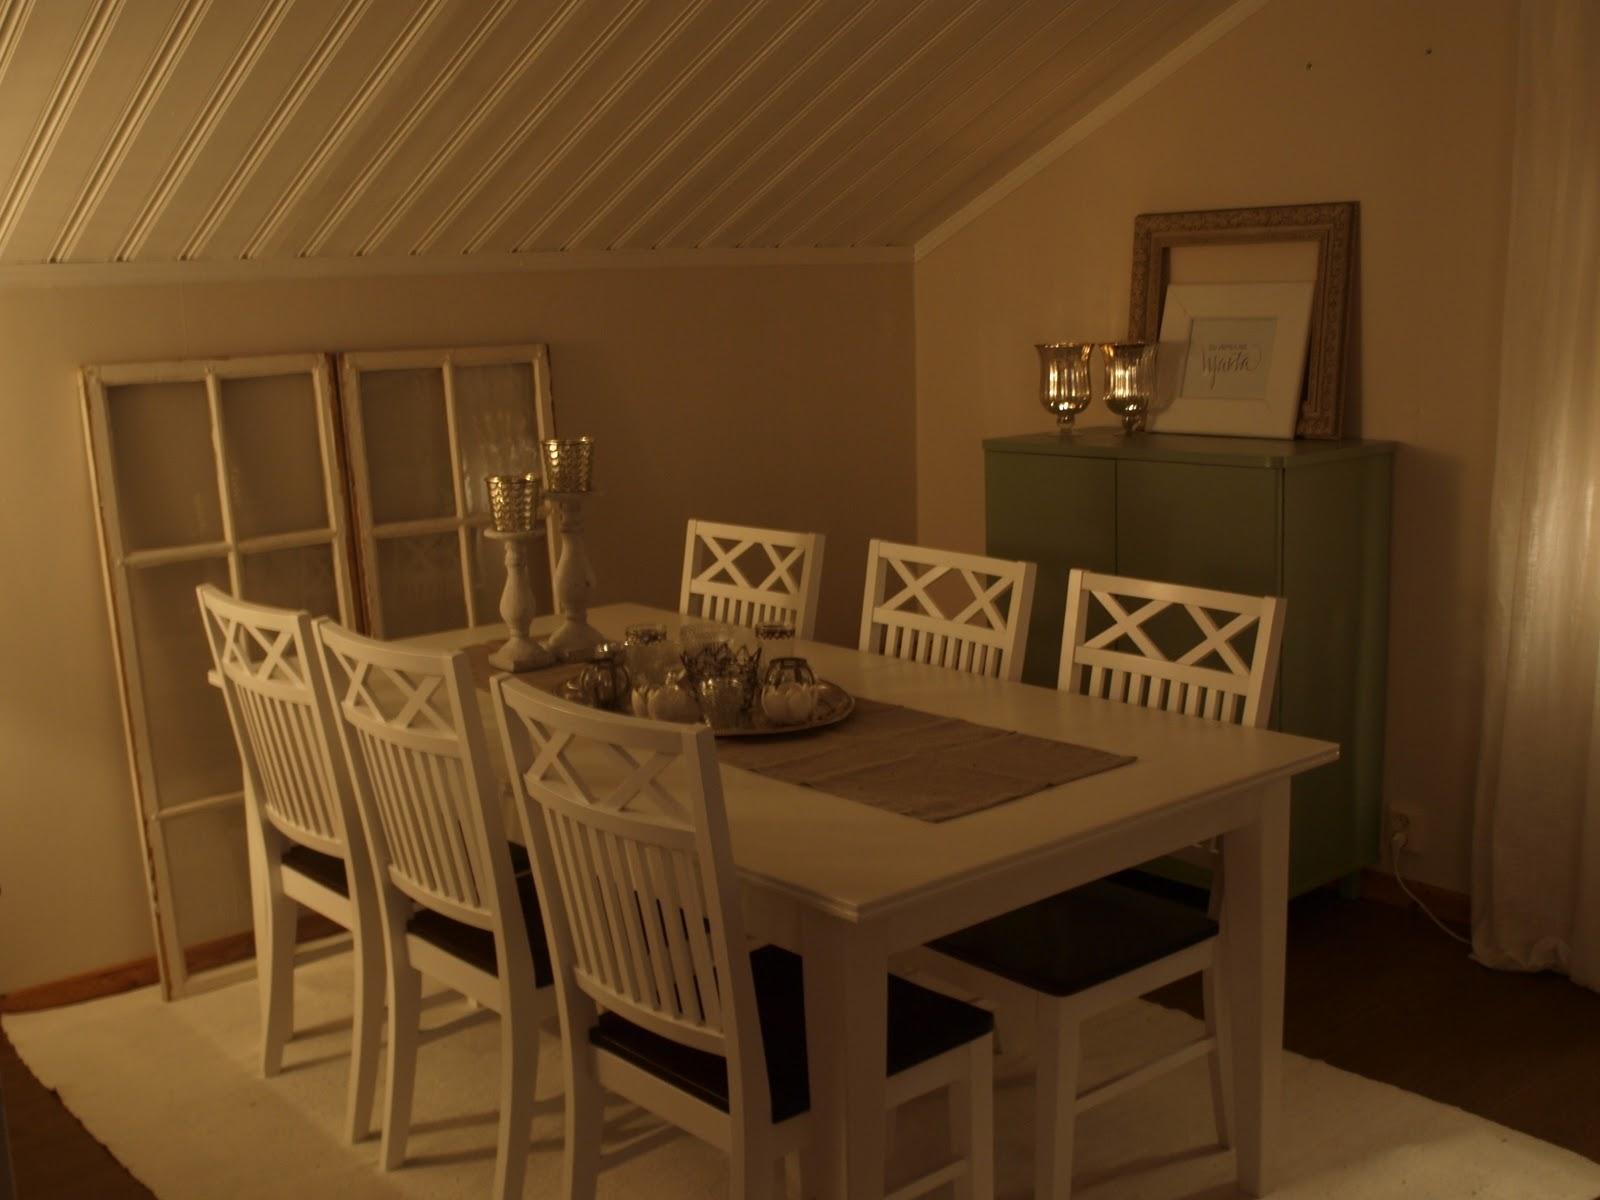 Annas vita hus: september 2011